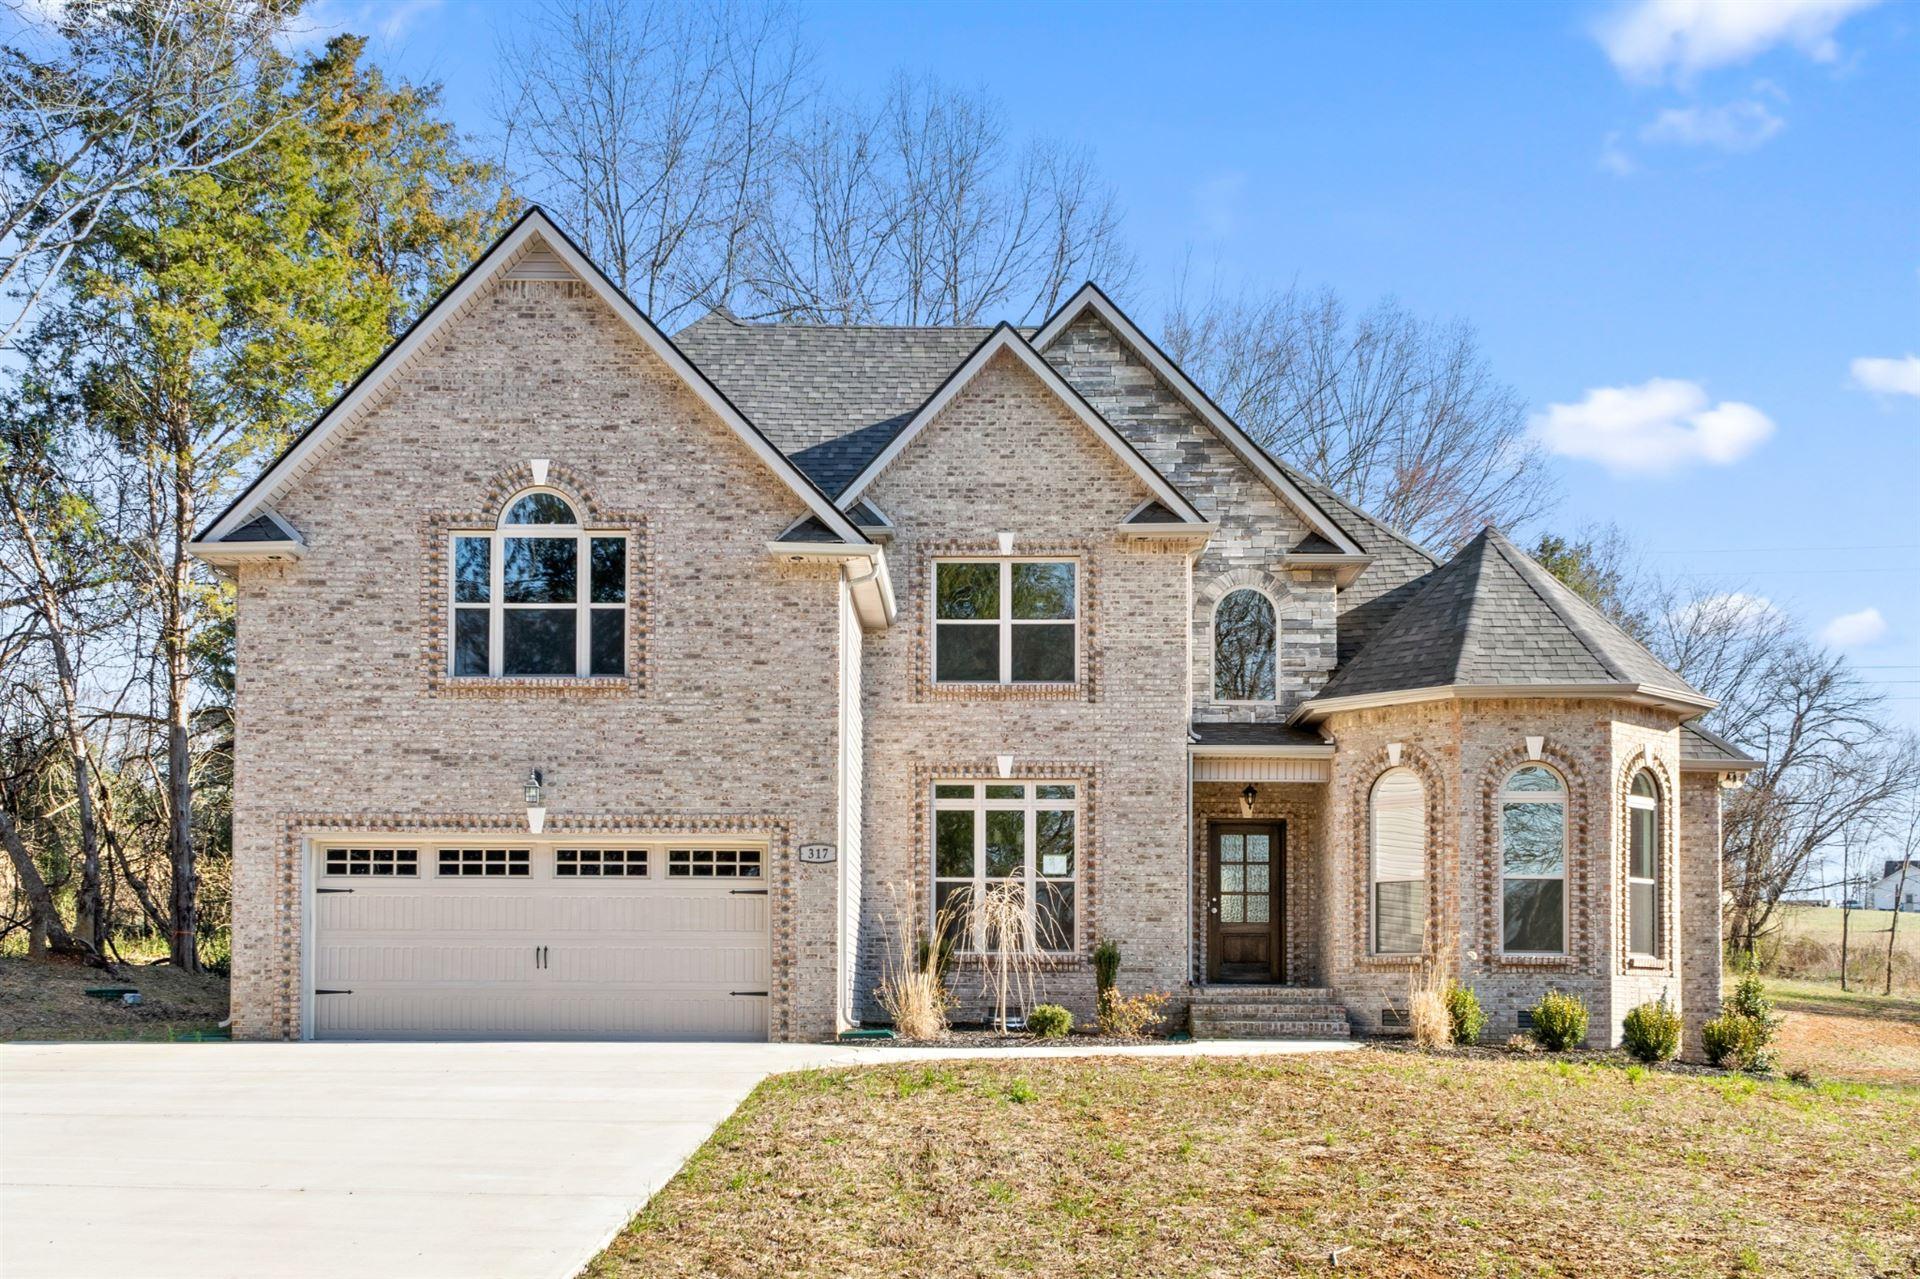 281 Poplar Hills, Clarksville, TN 37043 - MLS#: 2214339